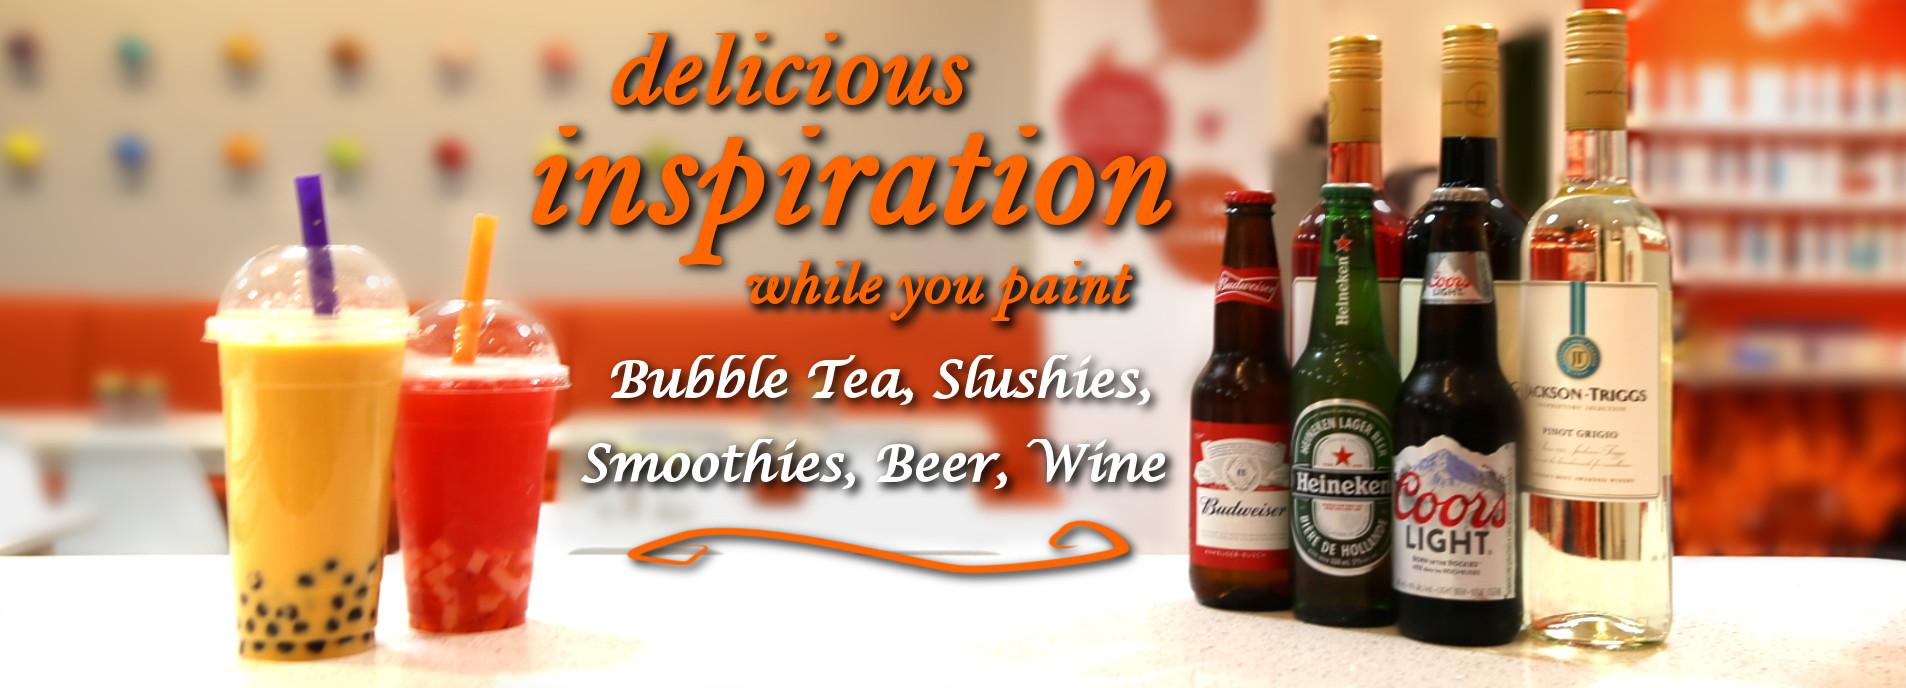 Art Haven Barrhaven Drinks and Bubble Tea